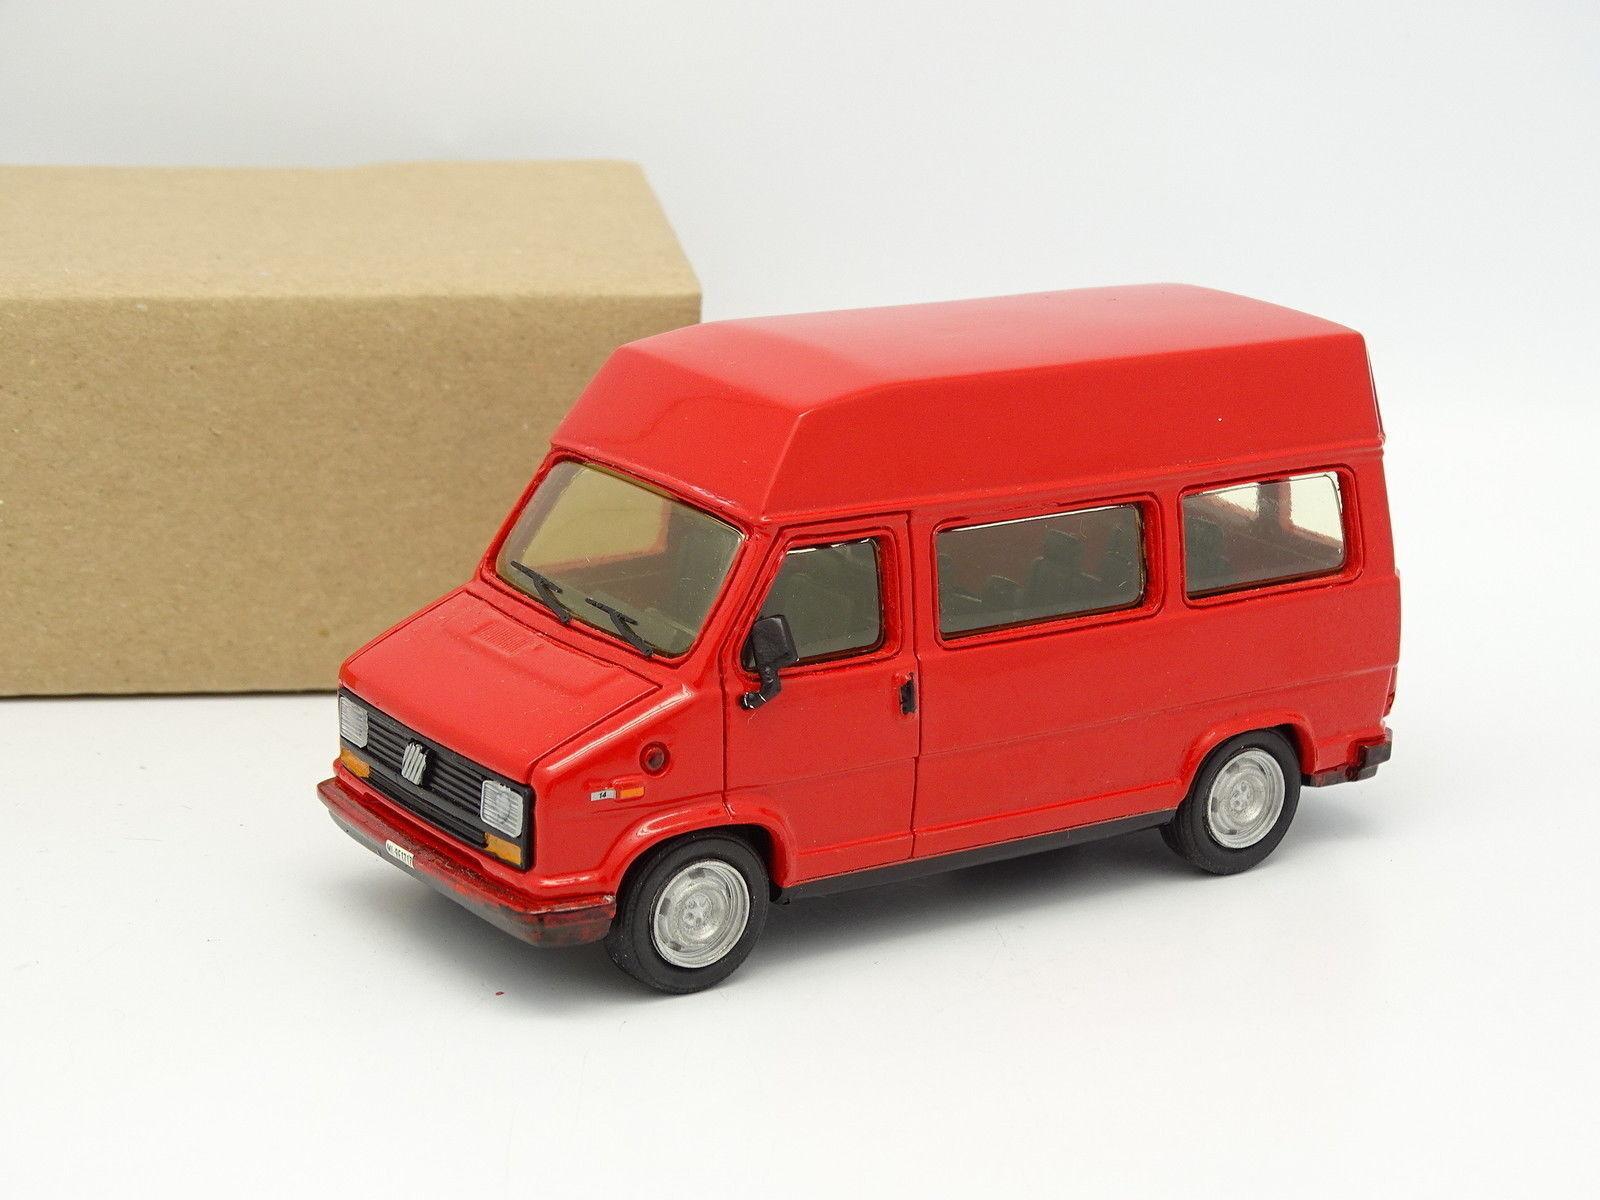 Giocher Resina Sb 1 43 - Fiat Ducato 14 1981 Minibus Rojo Raised